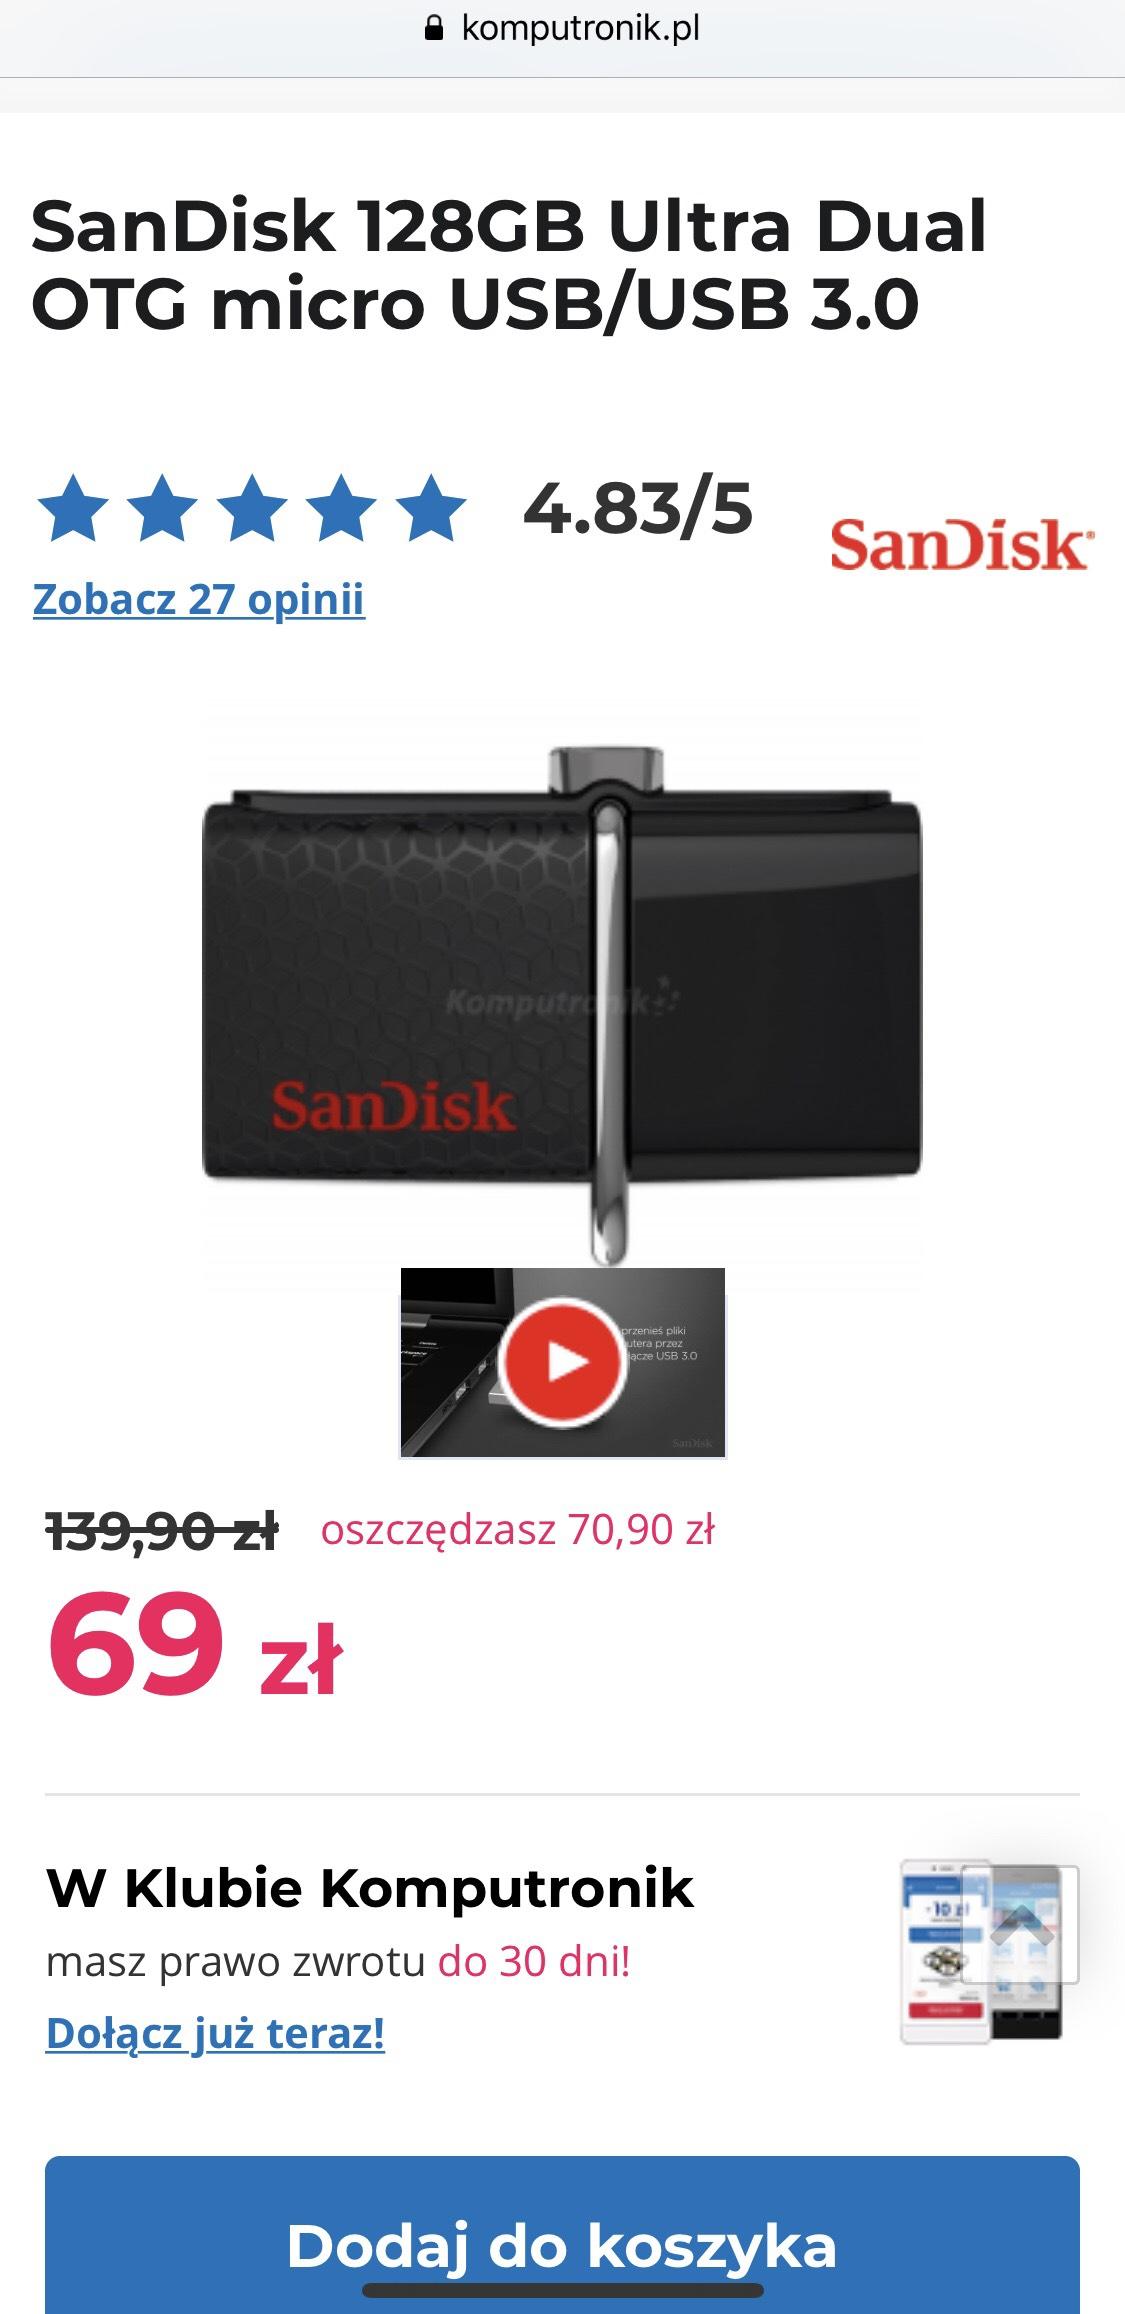 Pendrive SanDisk 128GB Ultra Dual OTG micro USB/USB 3.0